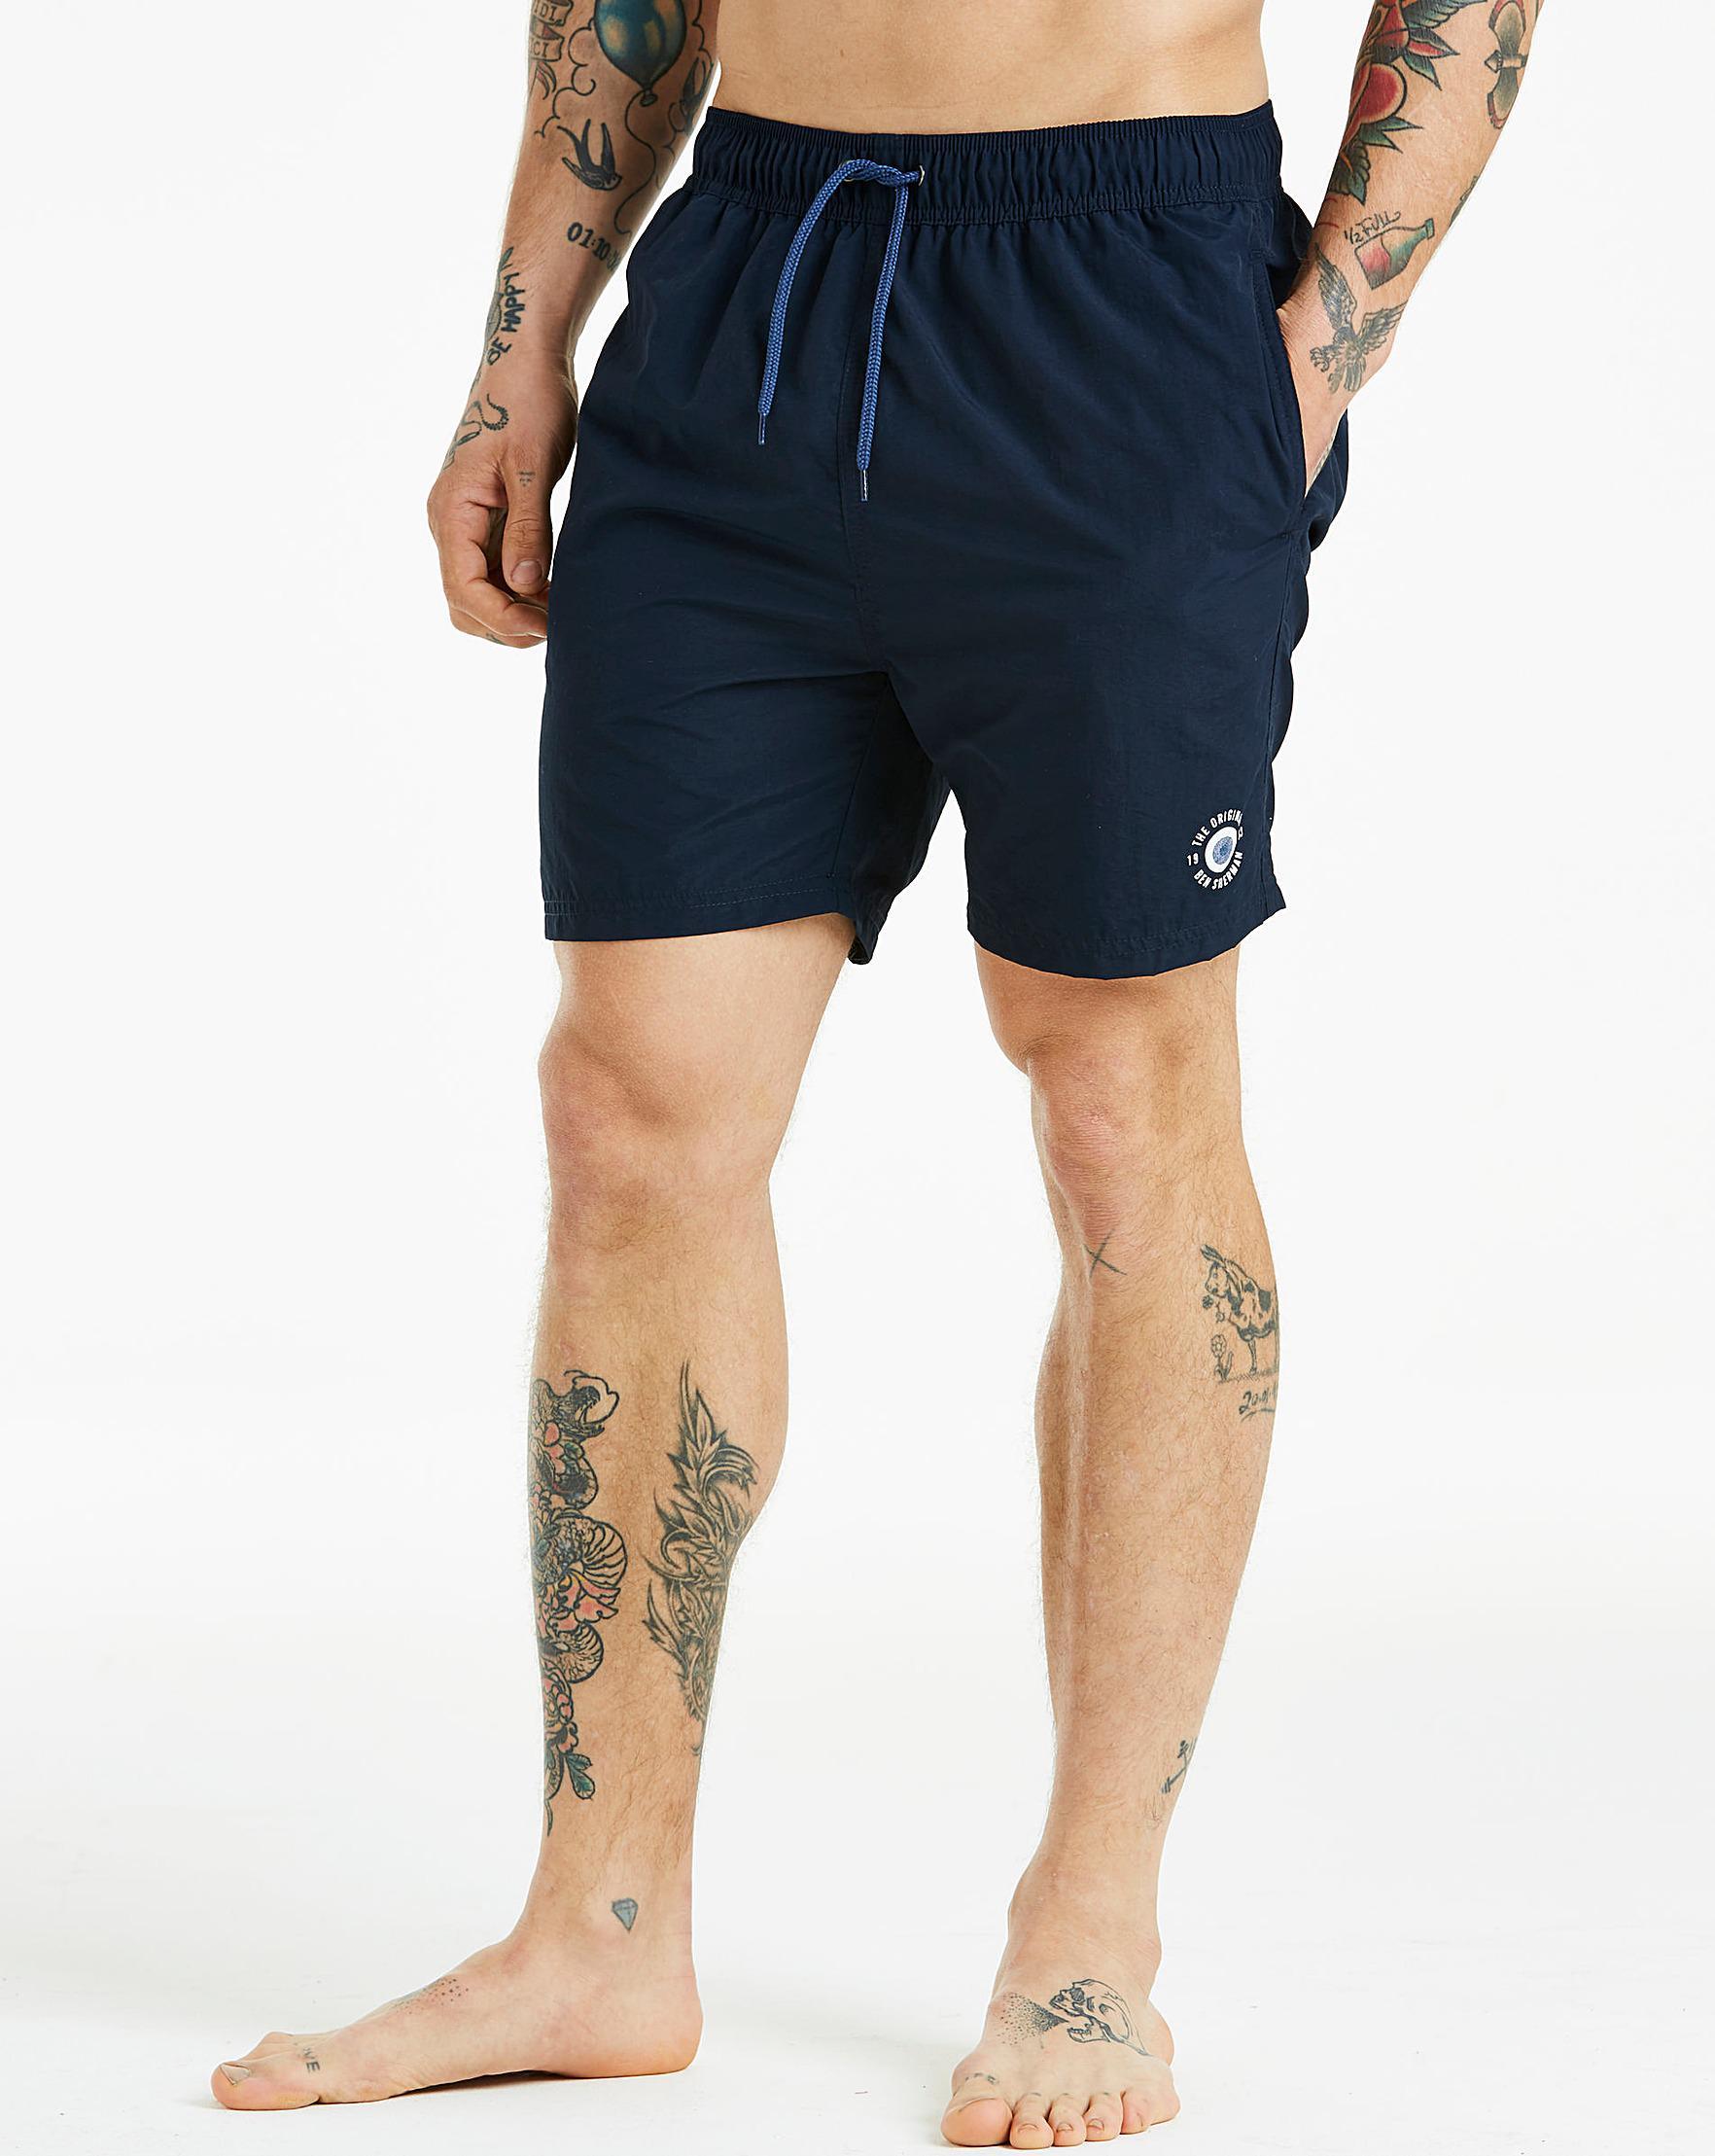 80998cfb8973e Ben Sherman Inpanema Navy Swim Shorts in Blue for Men - Lyst